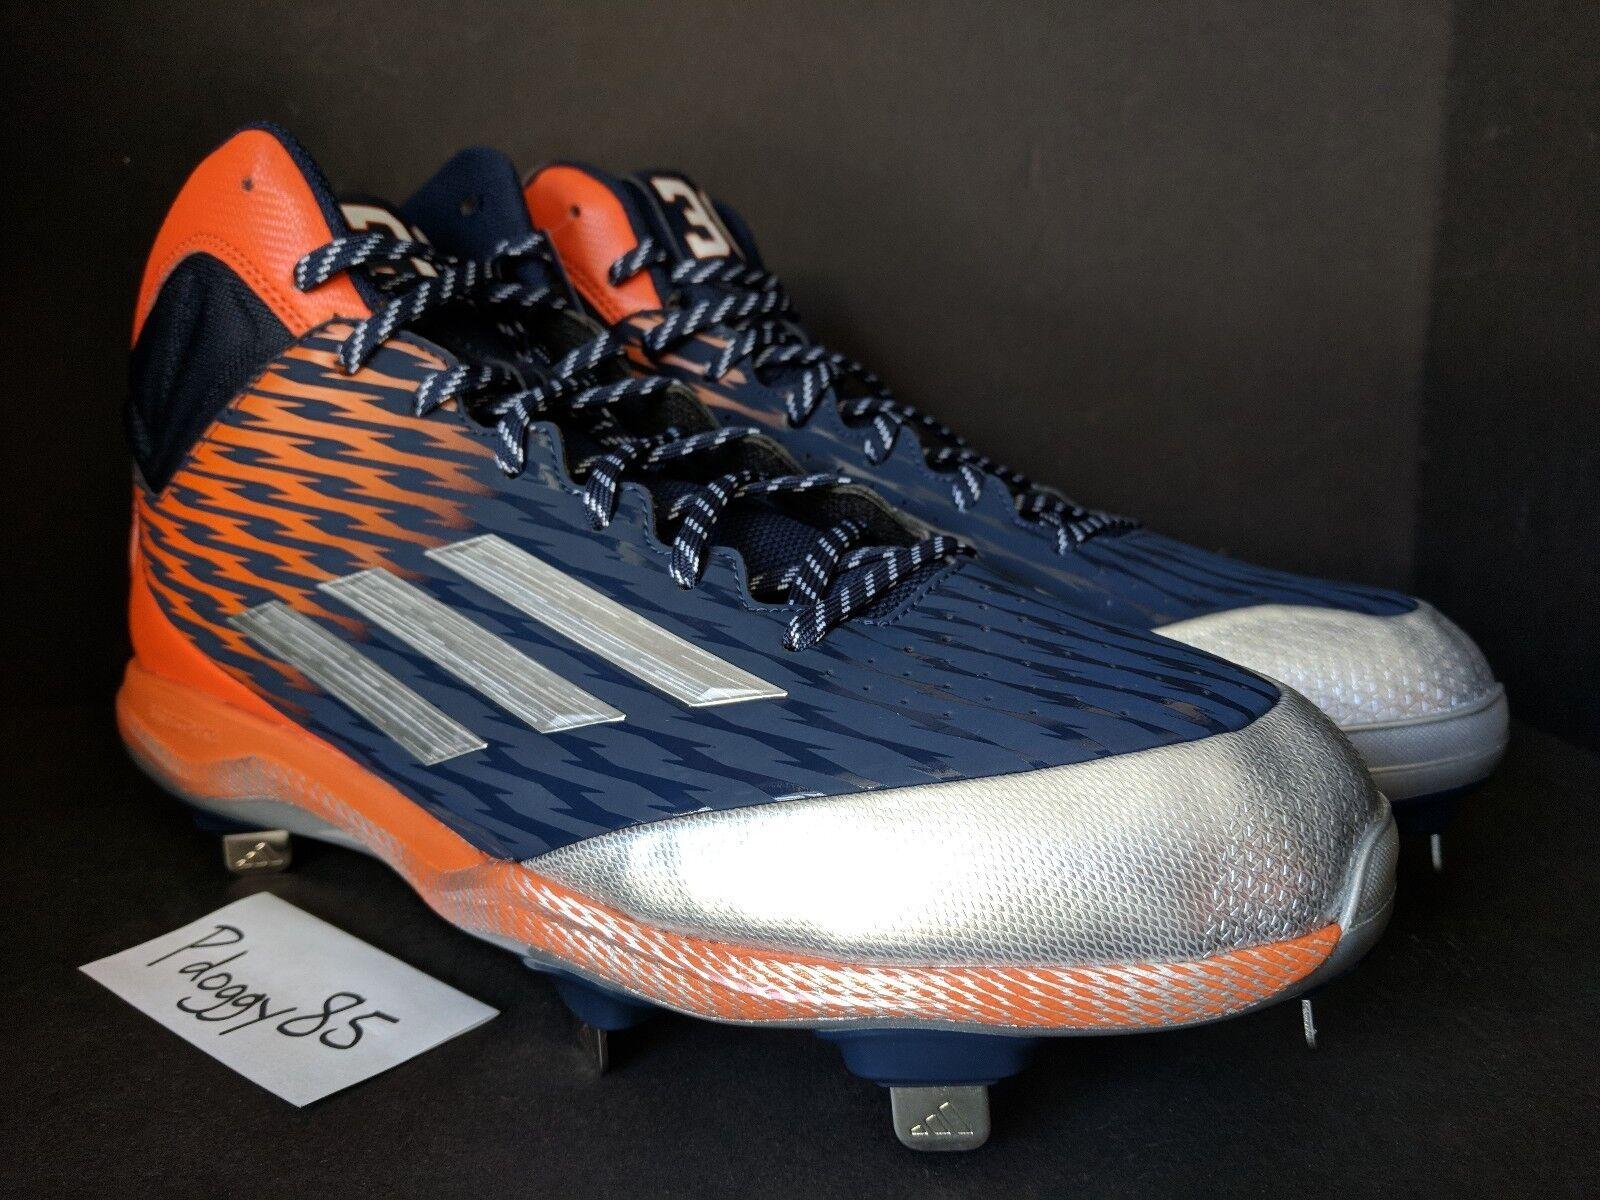 Adidas Litestrike Boost Carlos Gomez Player Exclusive PE Size 16 Game Worn